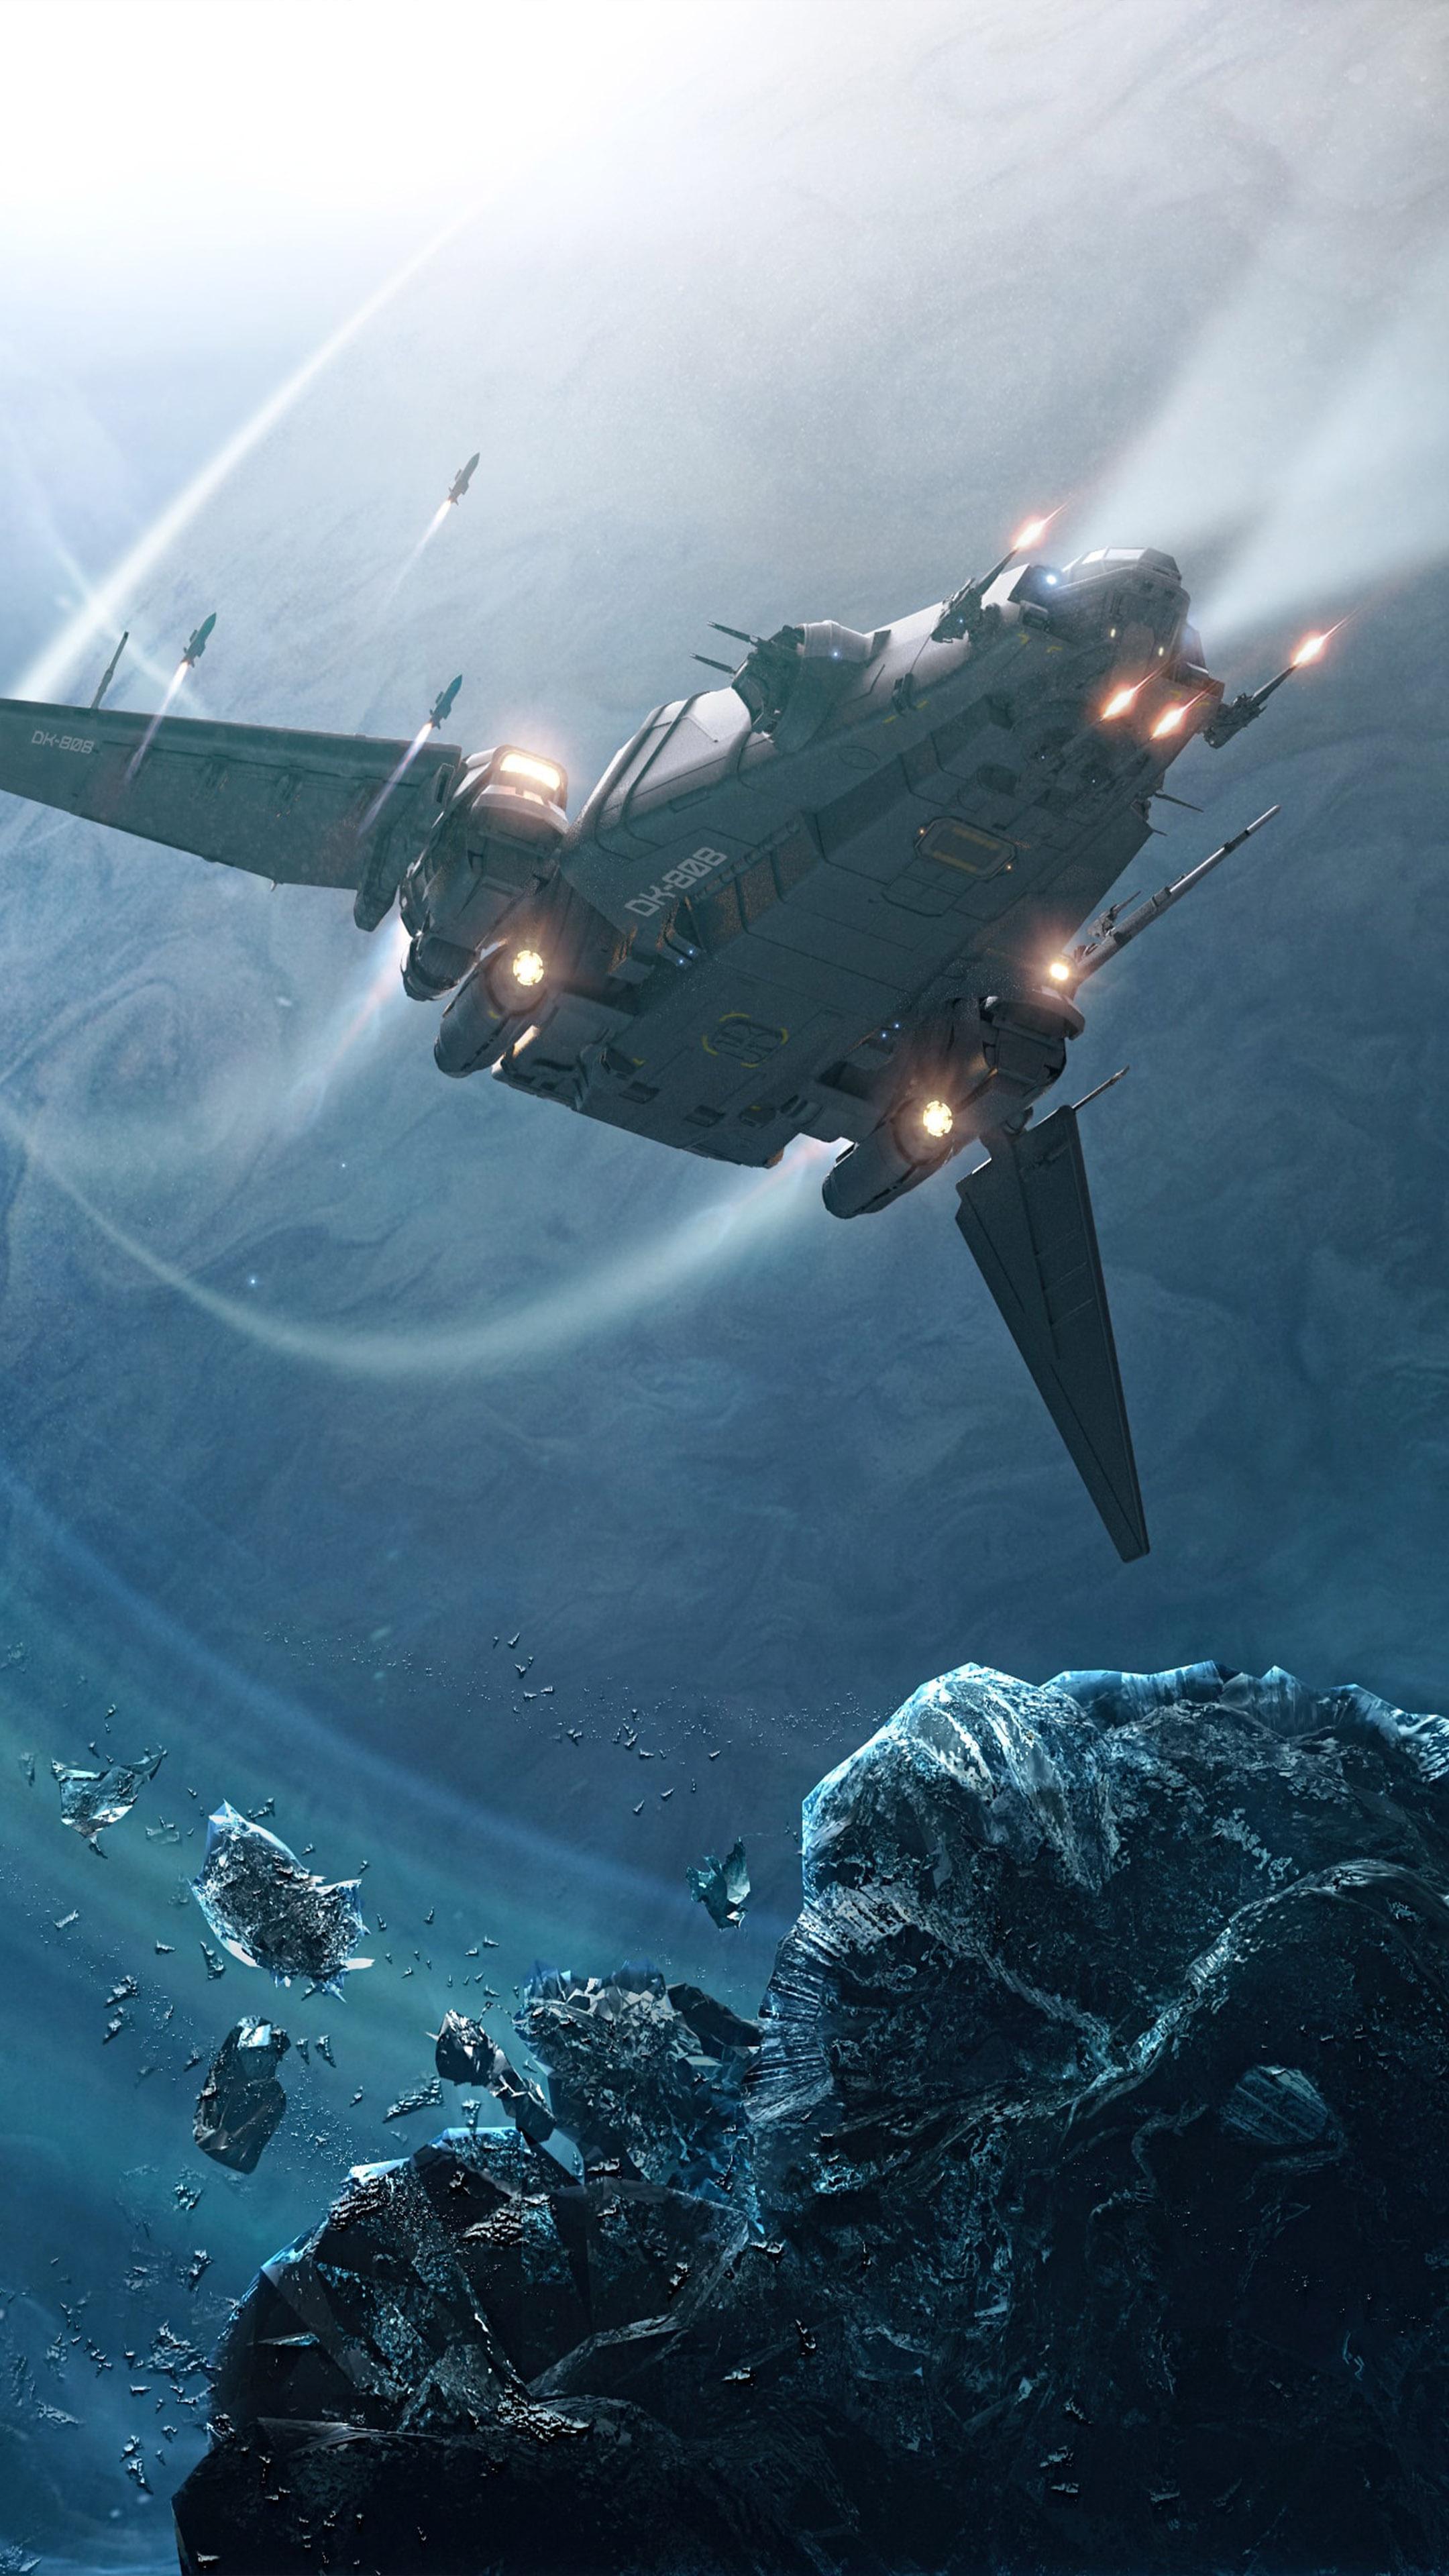 Spaceship Star Citizen Free 4K Ultra HD Mobile Wallpaper